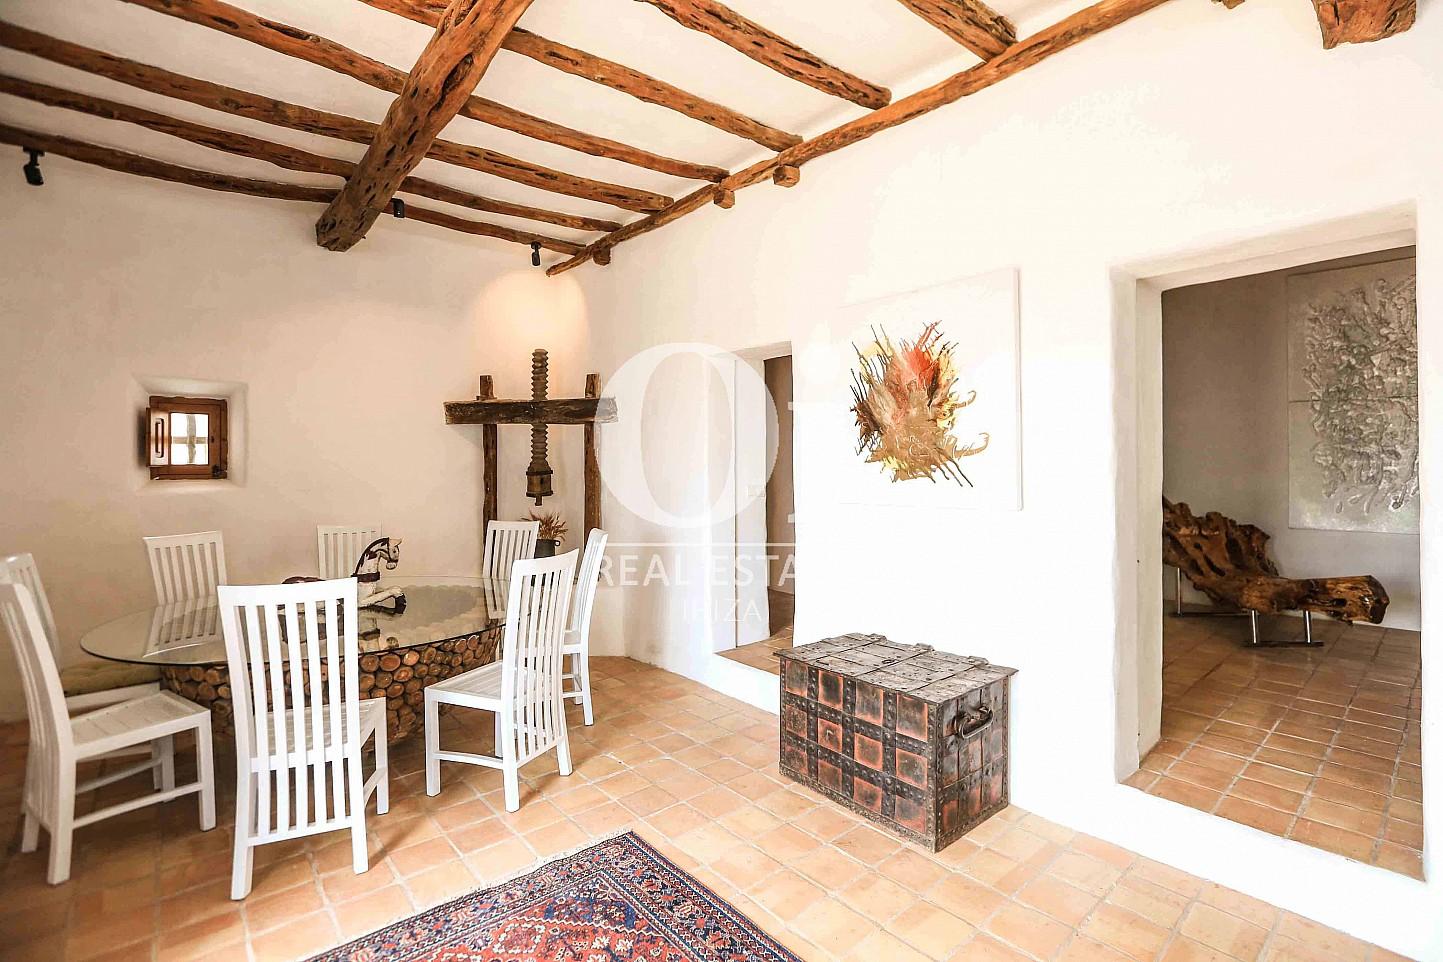 Salón-comedor de casa en alquiler vacacional en zona Puig d'en Valls, Ibiza